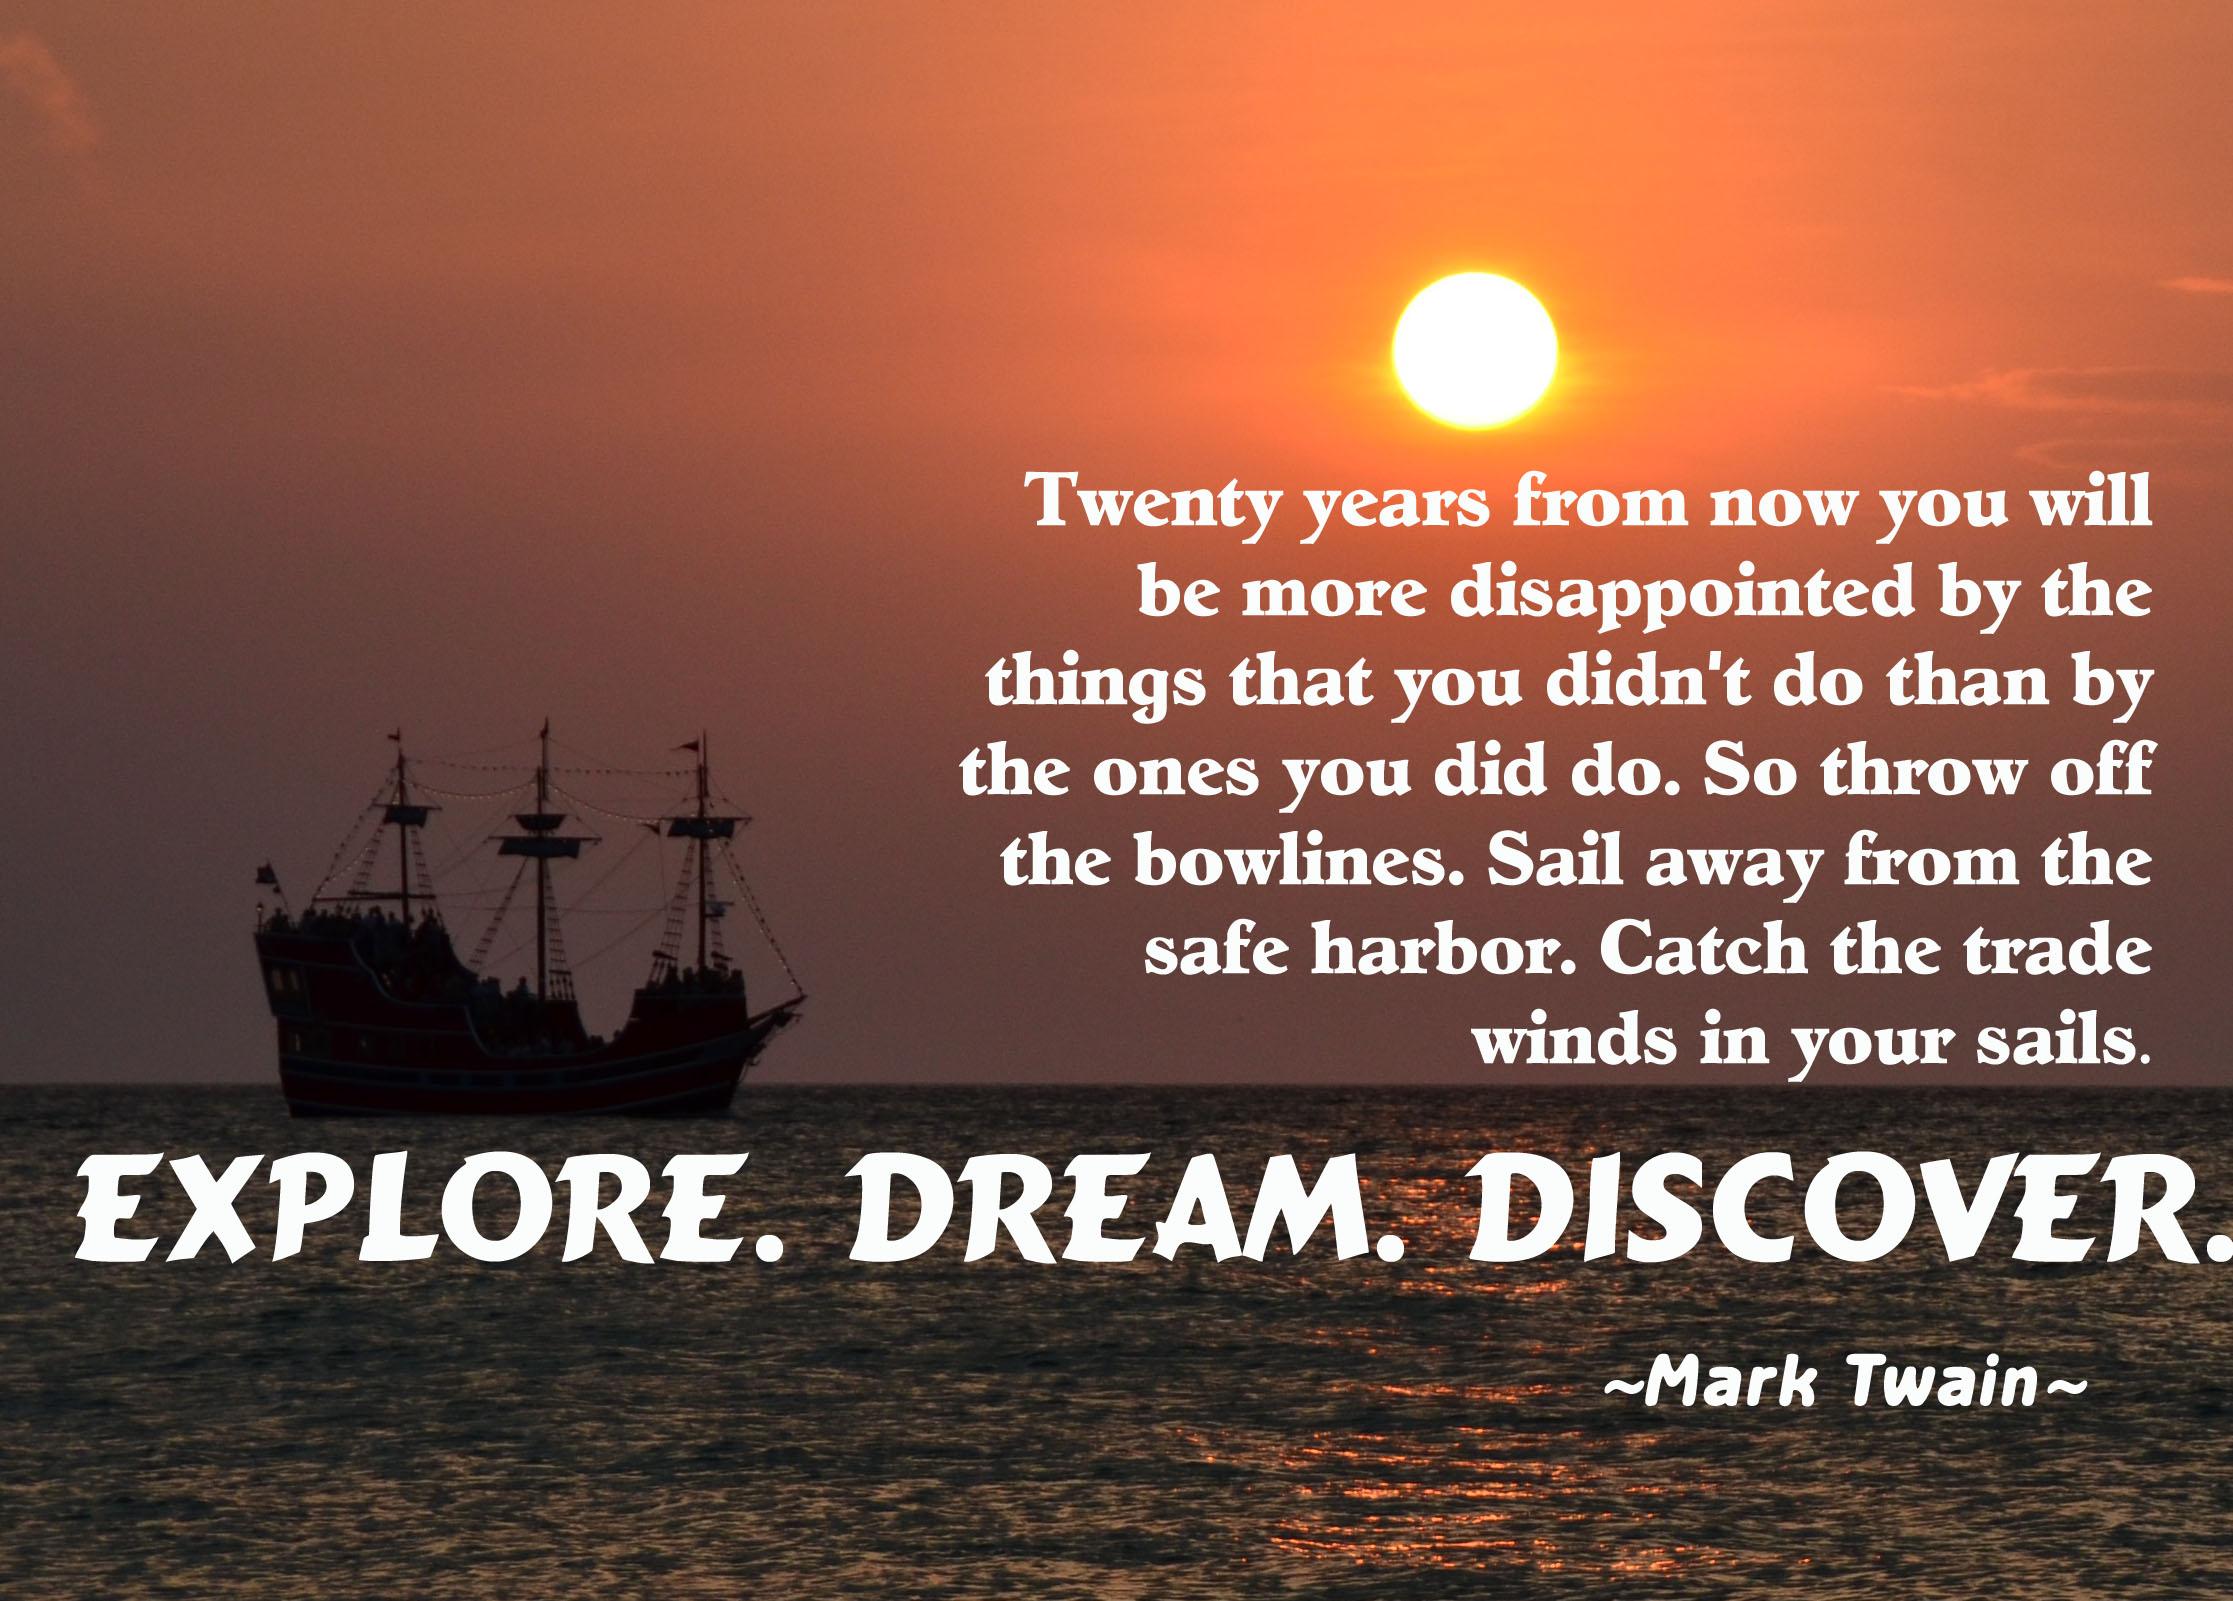 Sailing Quotes Inspirational Quotesgram: Inspirational Spa Quotes. QuotesGram